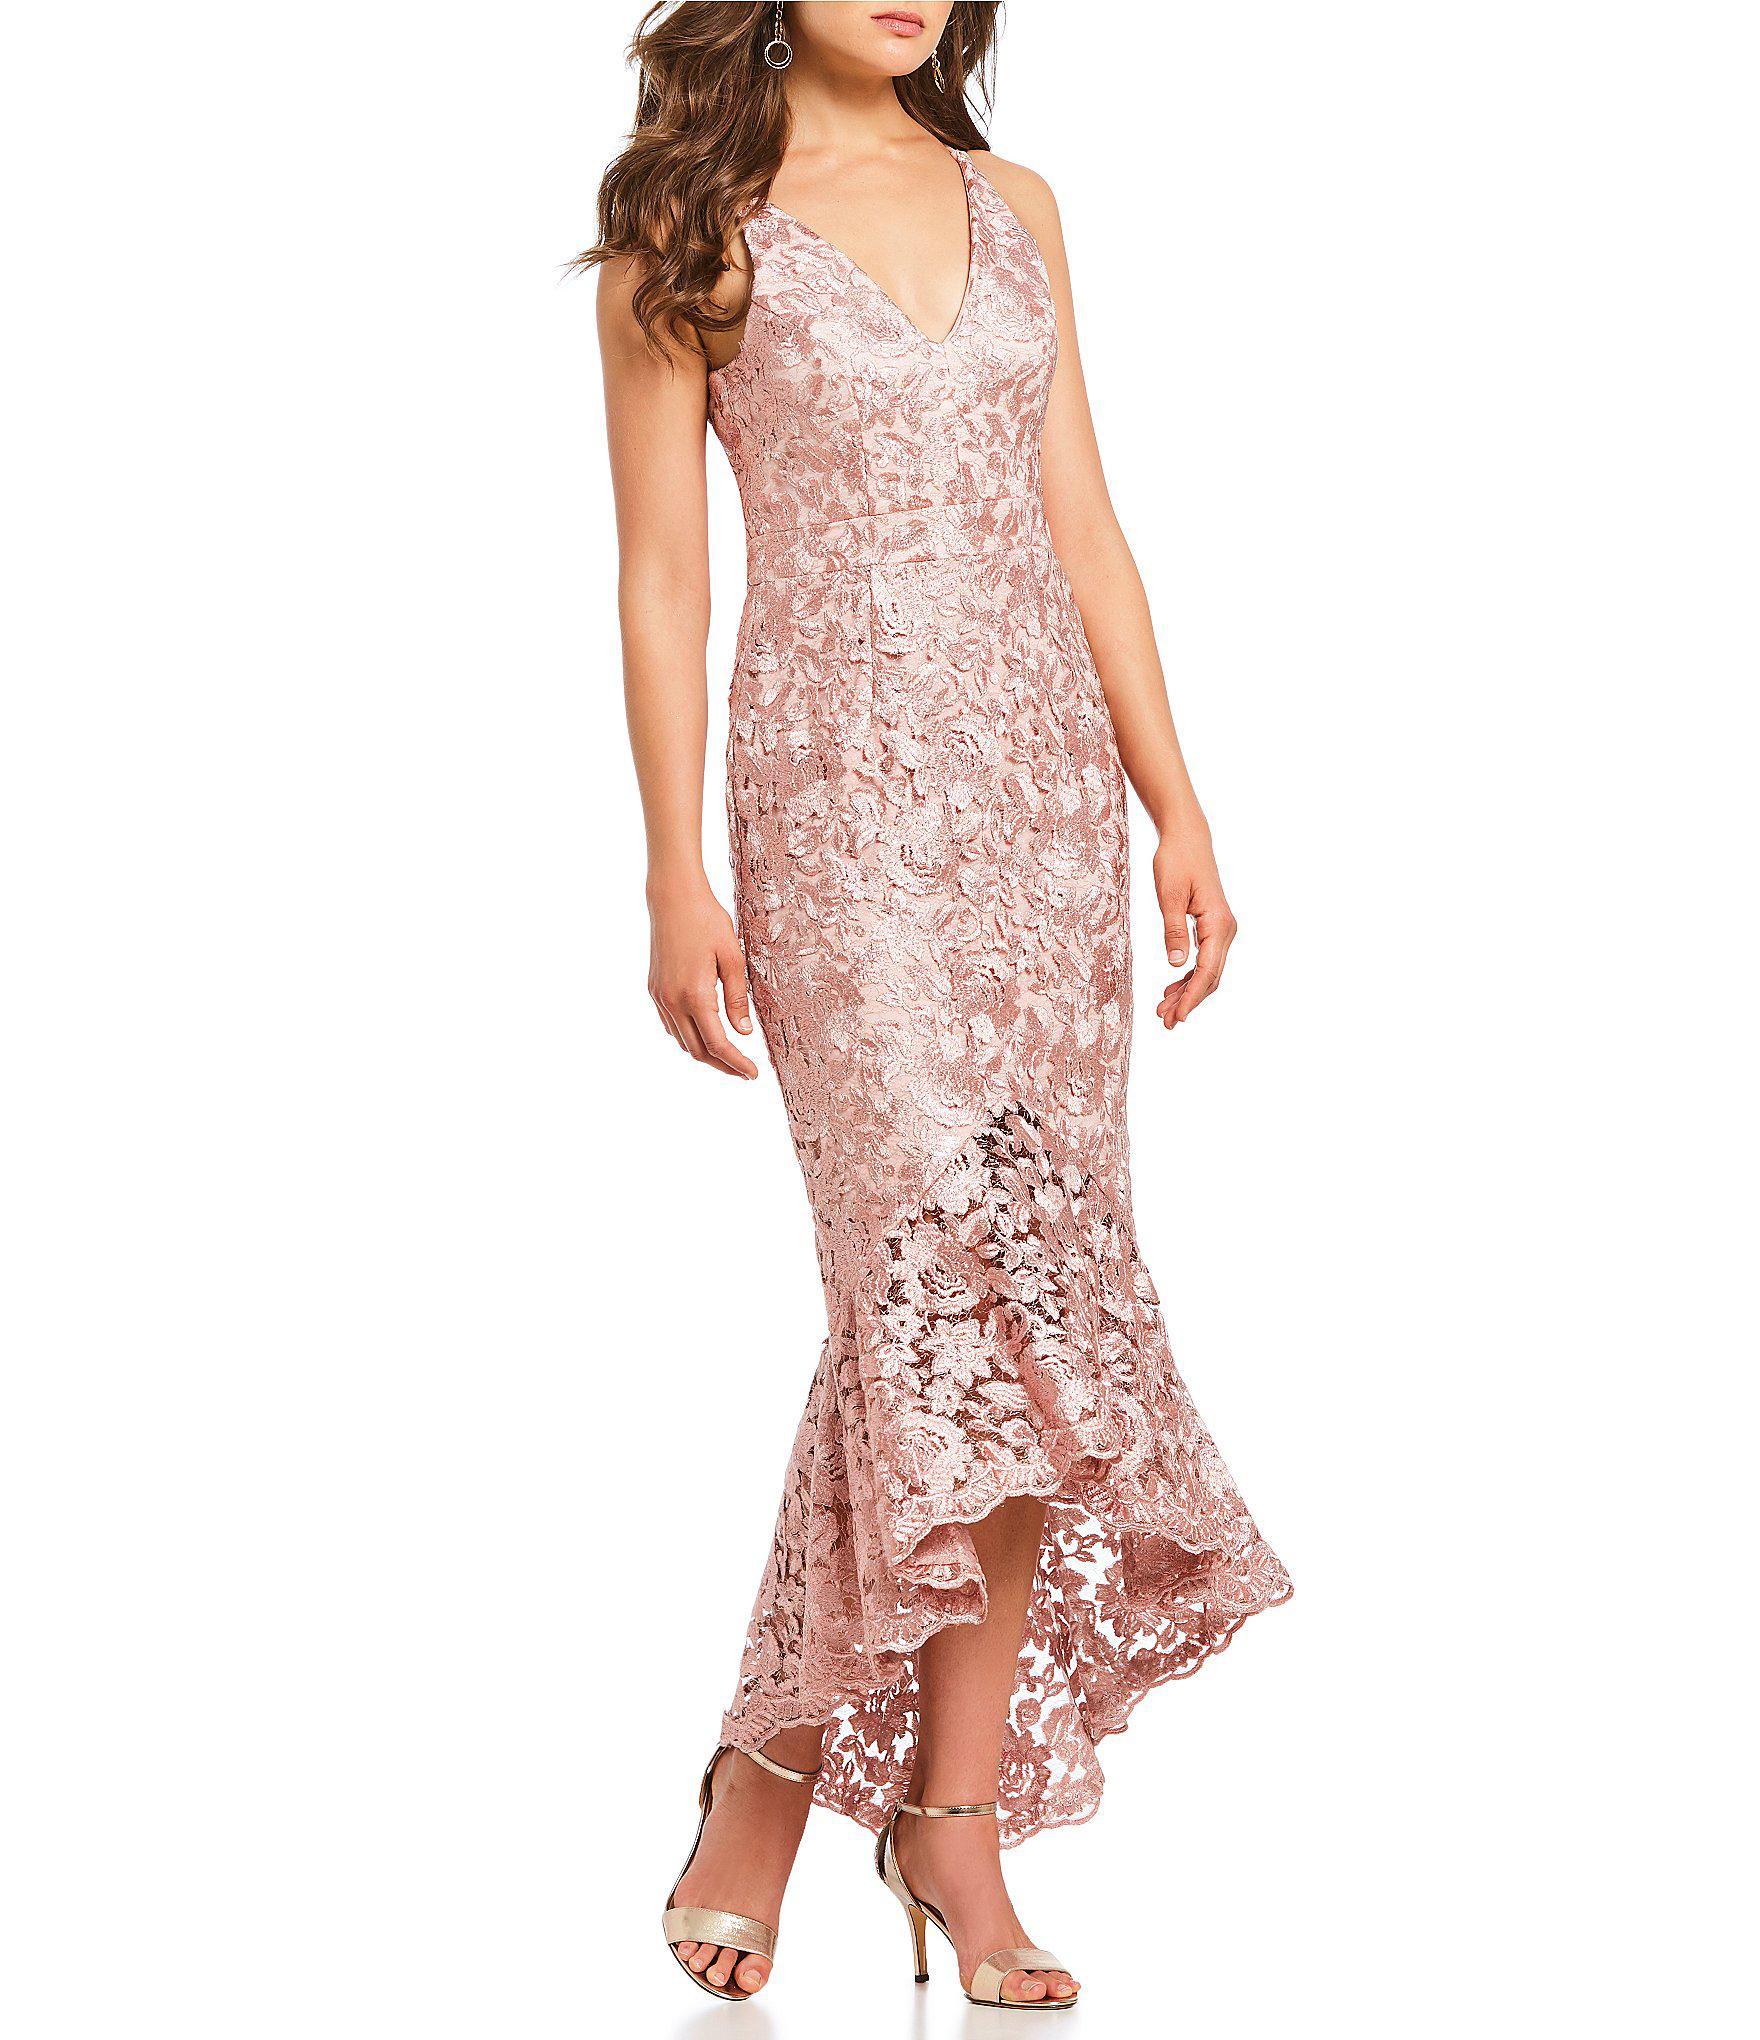 ac7303b0879 Xscape Formal Dresses Dillards - Gomes Weine AG